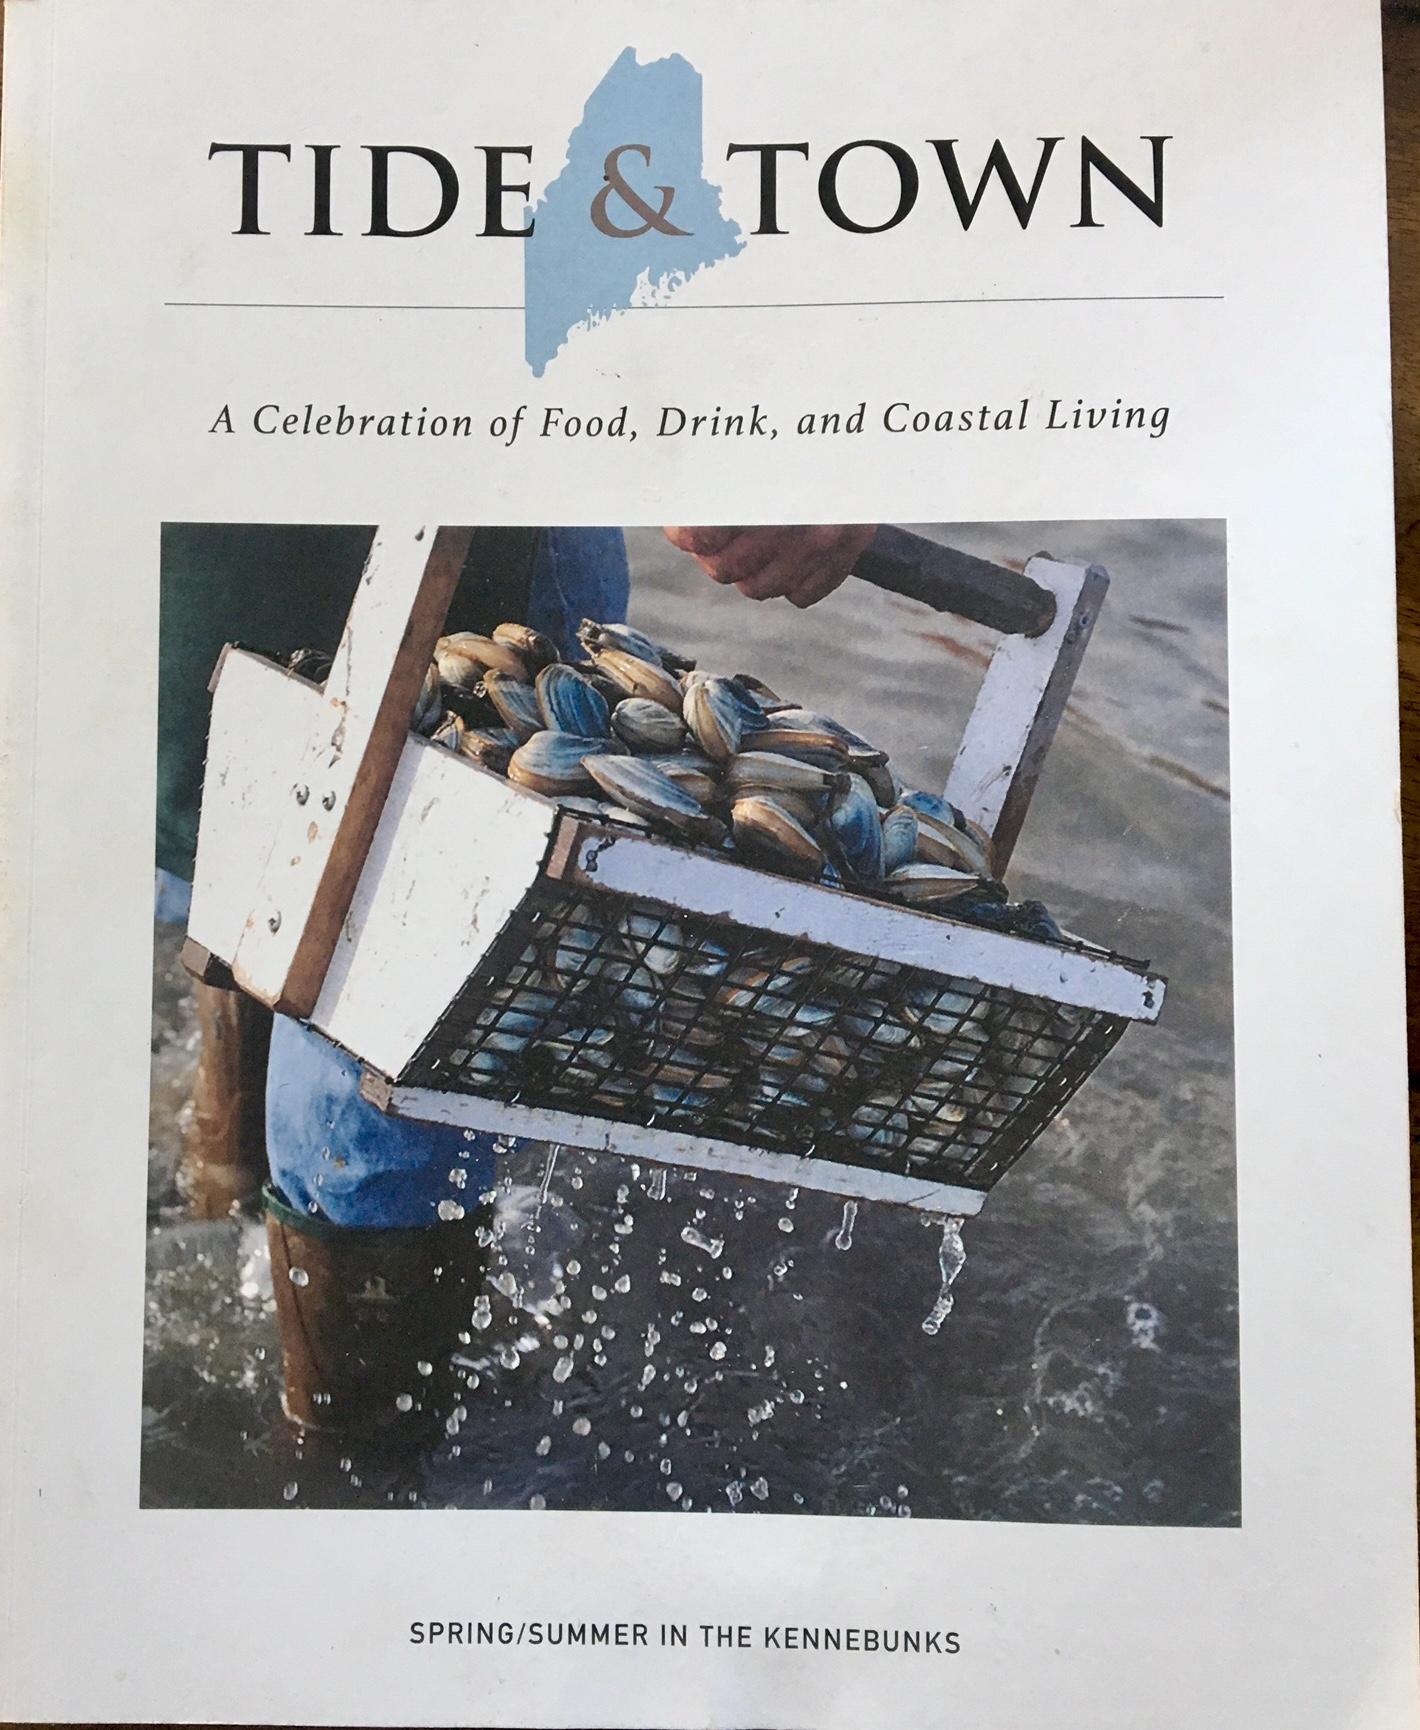 Tide & Town